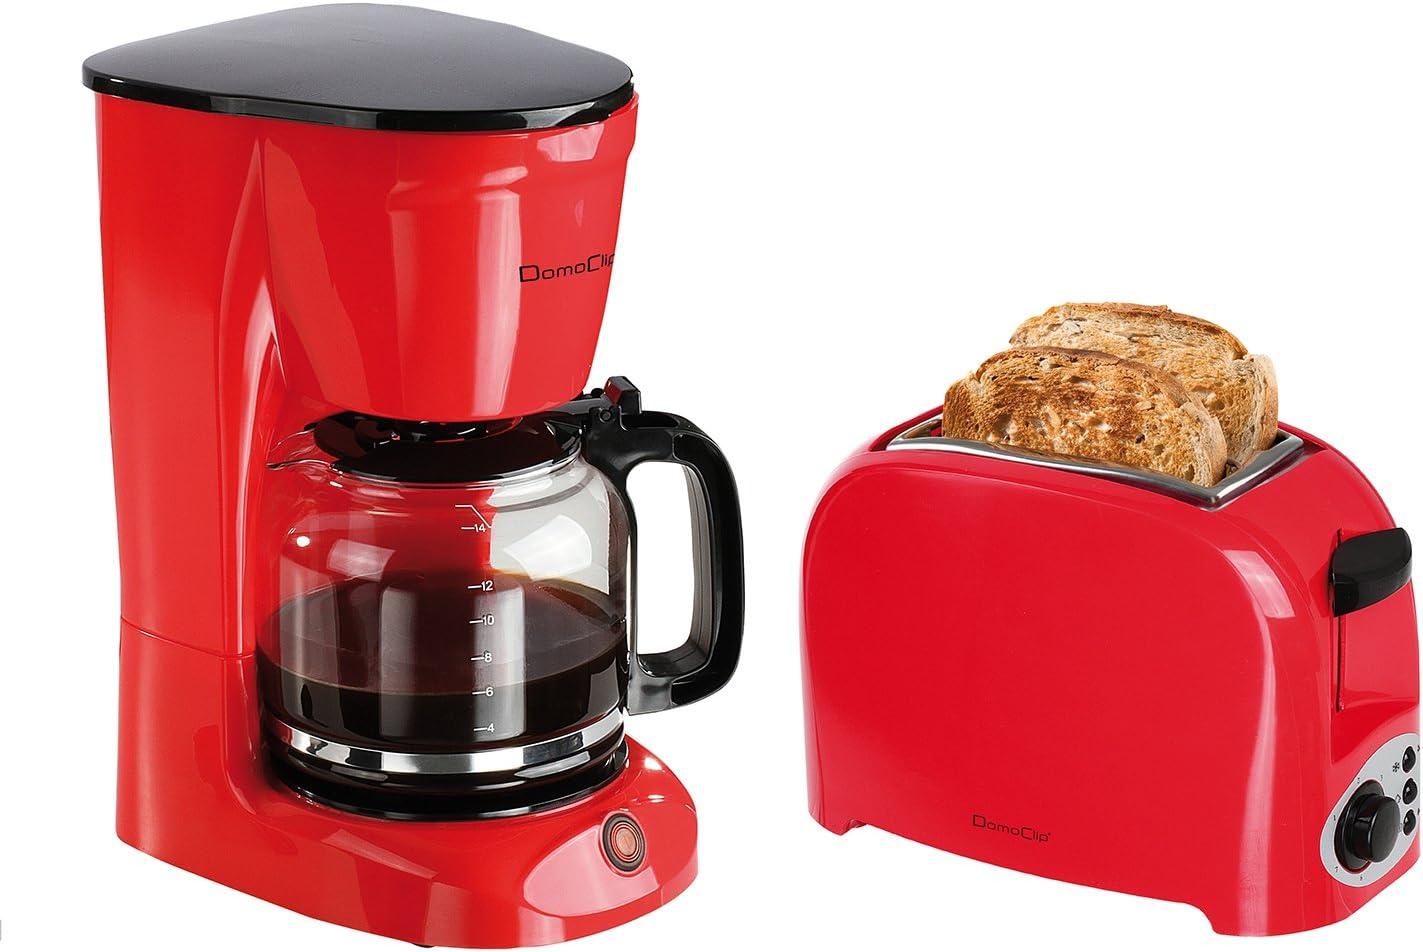 Set desayuno – Tostadora 2 ranuras rojo/negro + cafetera eléctrica ...